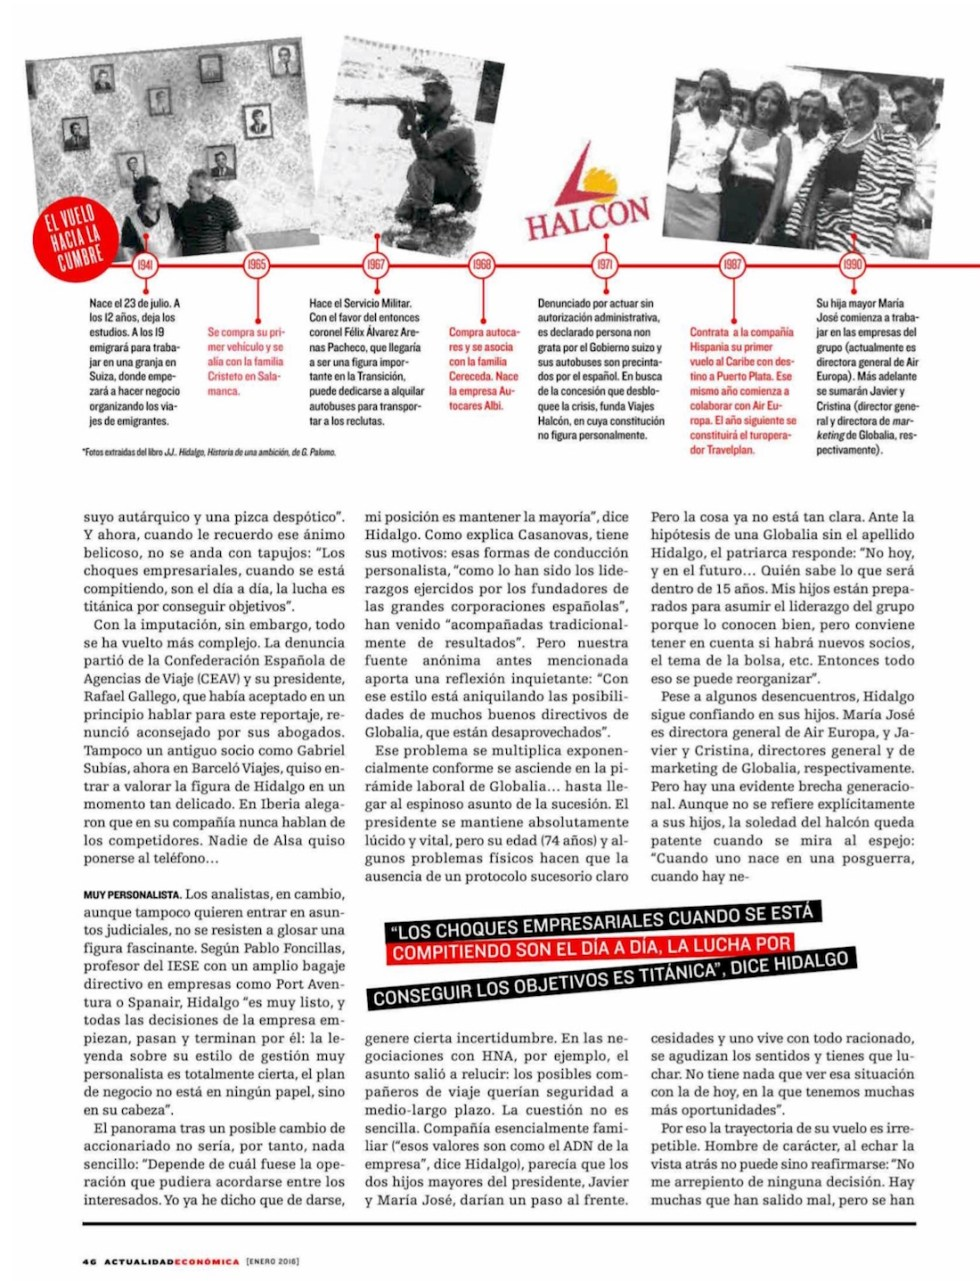 ActualidadEconomica_PF2